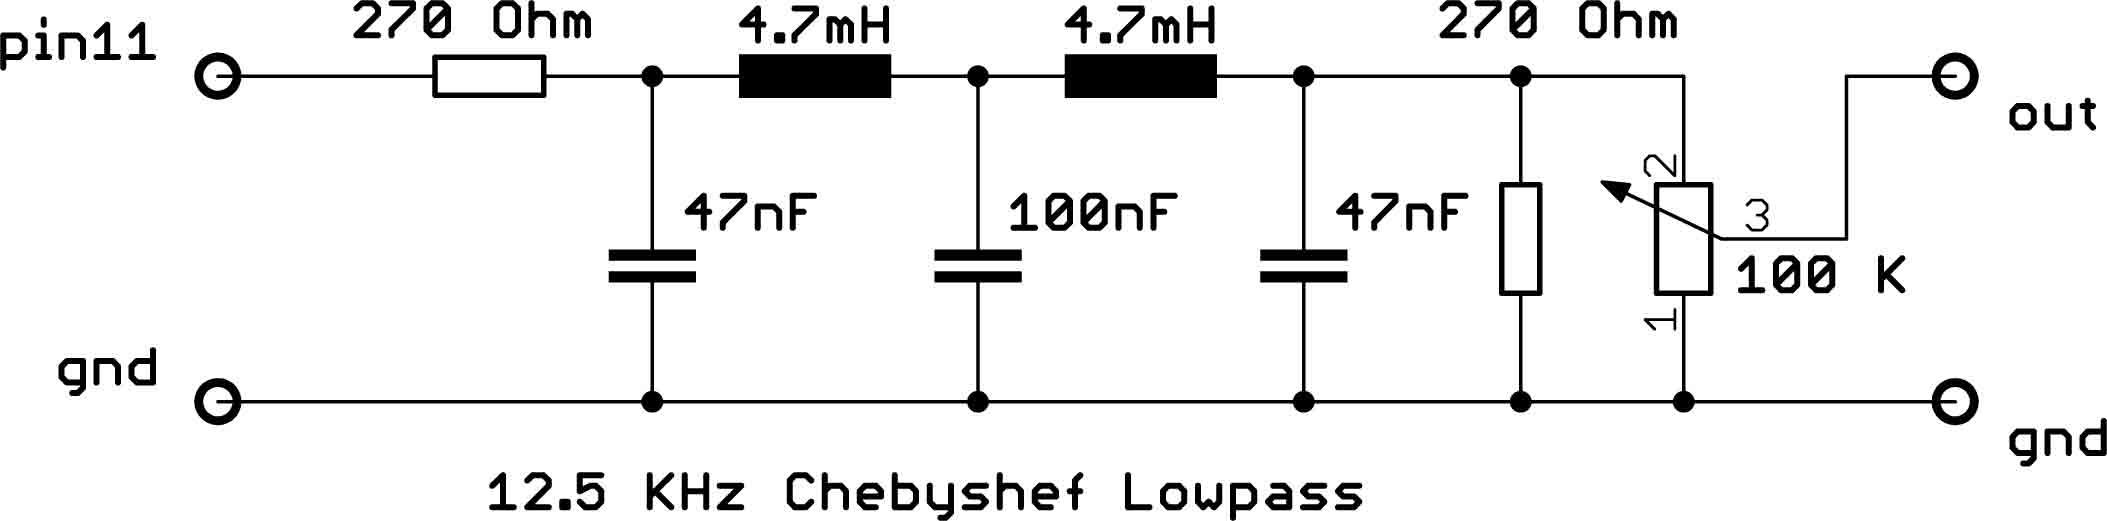 circuit diagram signal generator symbol function generator circuit rh color castles com